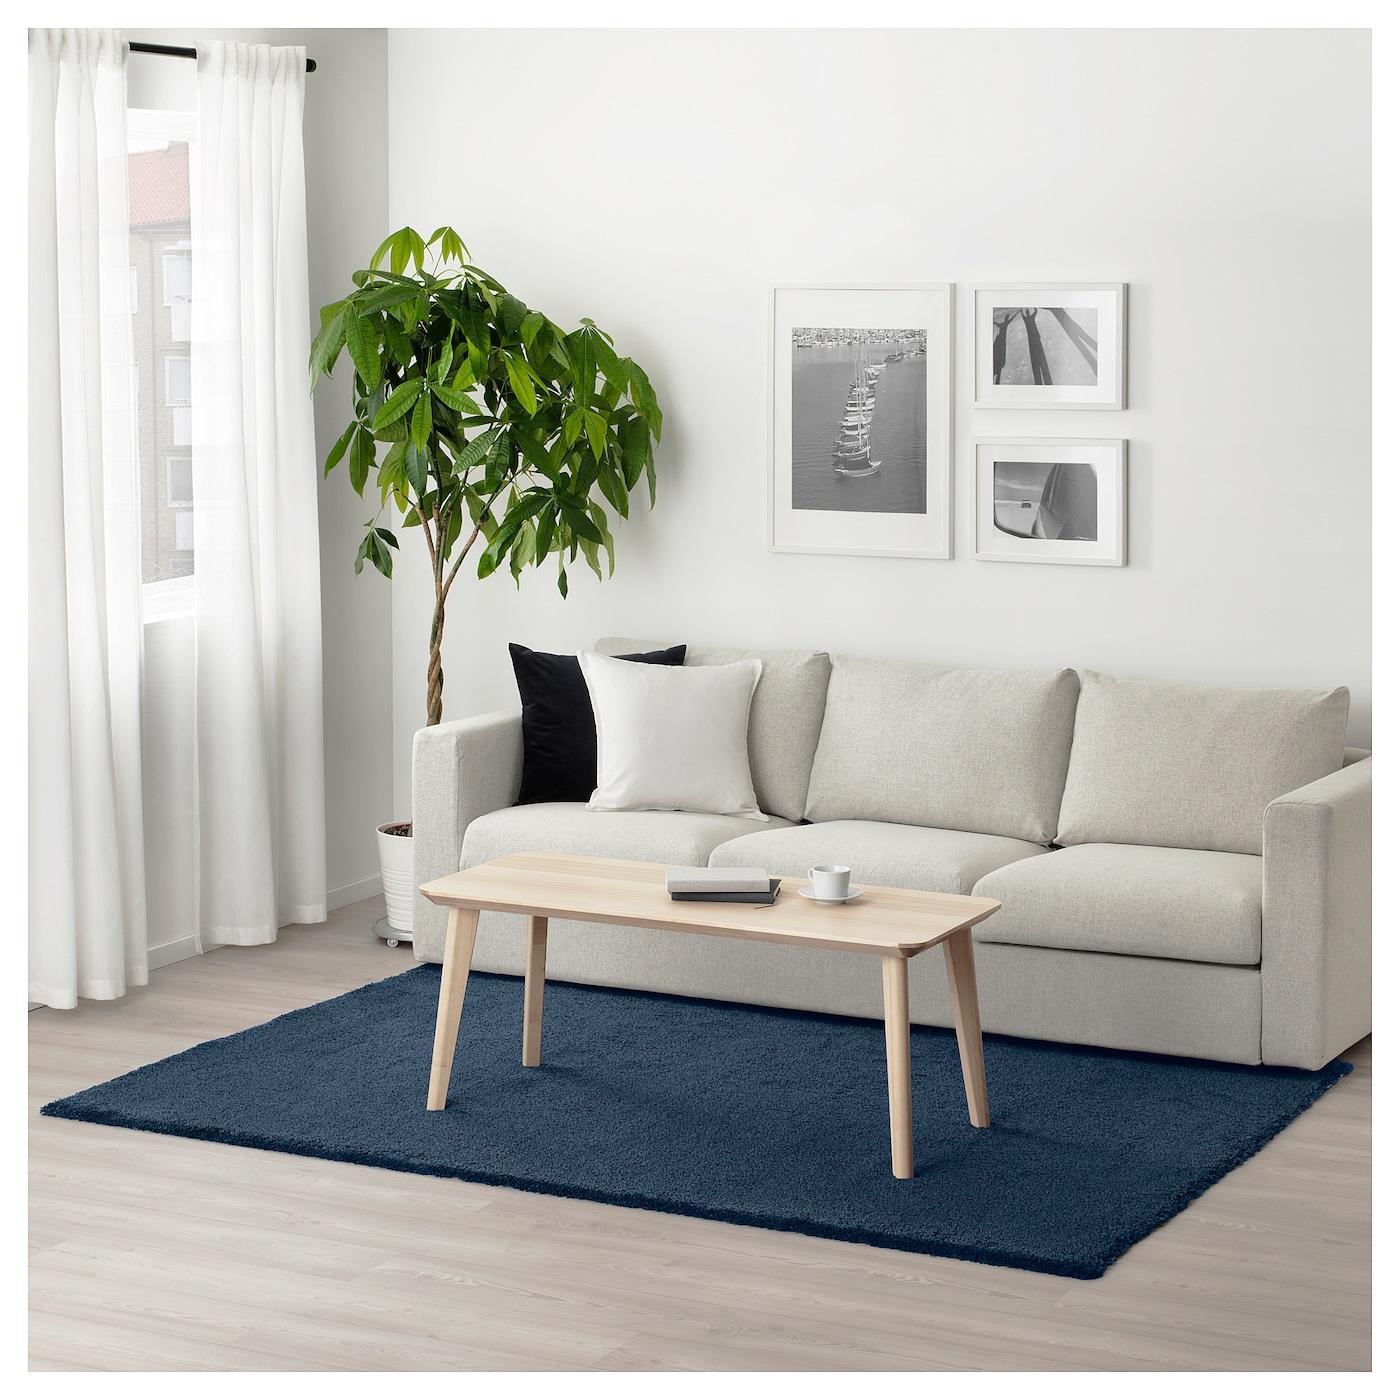 dum tapis poils hauts bleu fonc 170 x 240 cm ikea. Black Bedroom Furniture Sets. Home Design Ideas